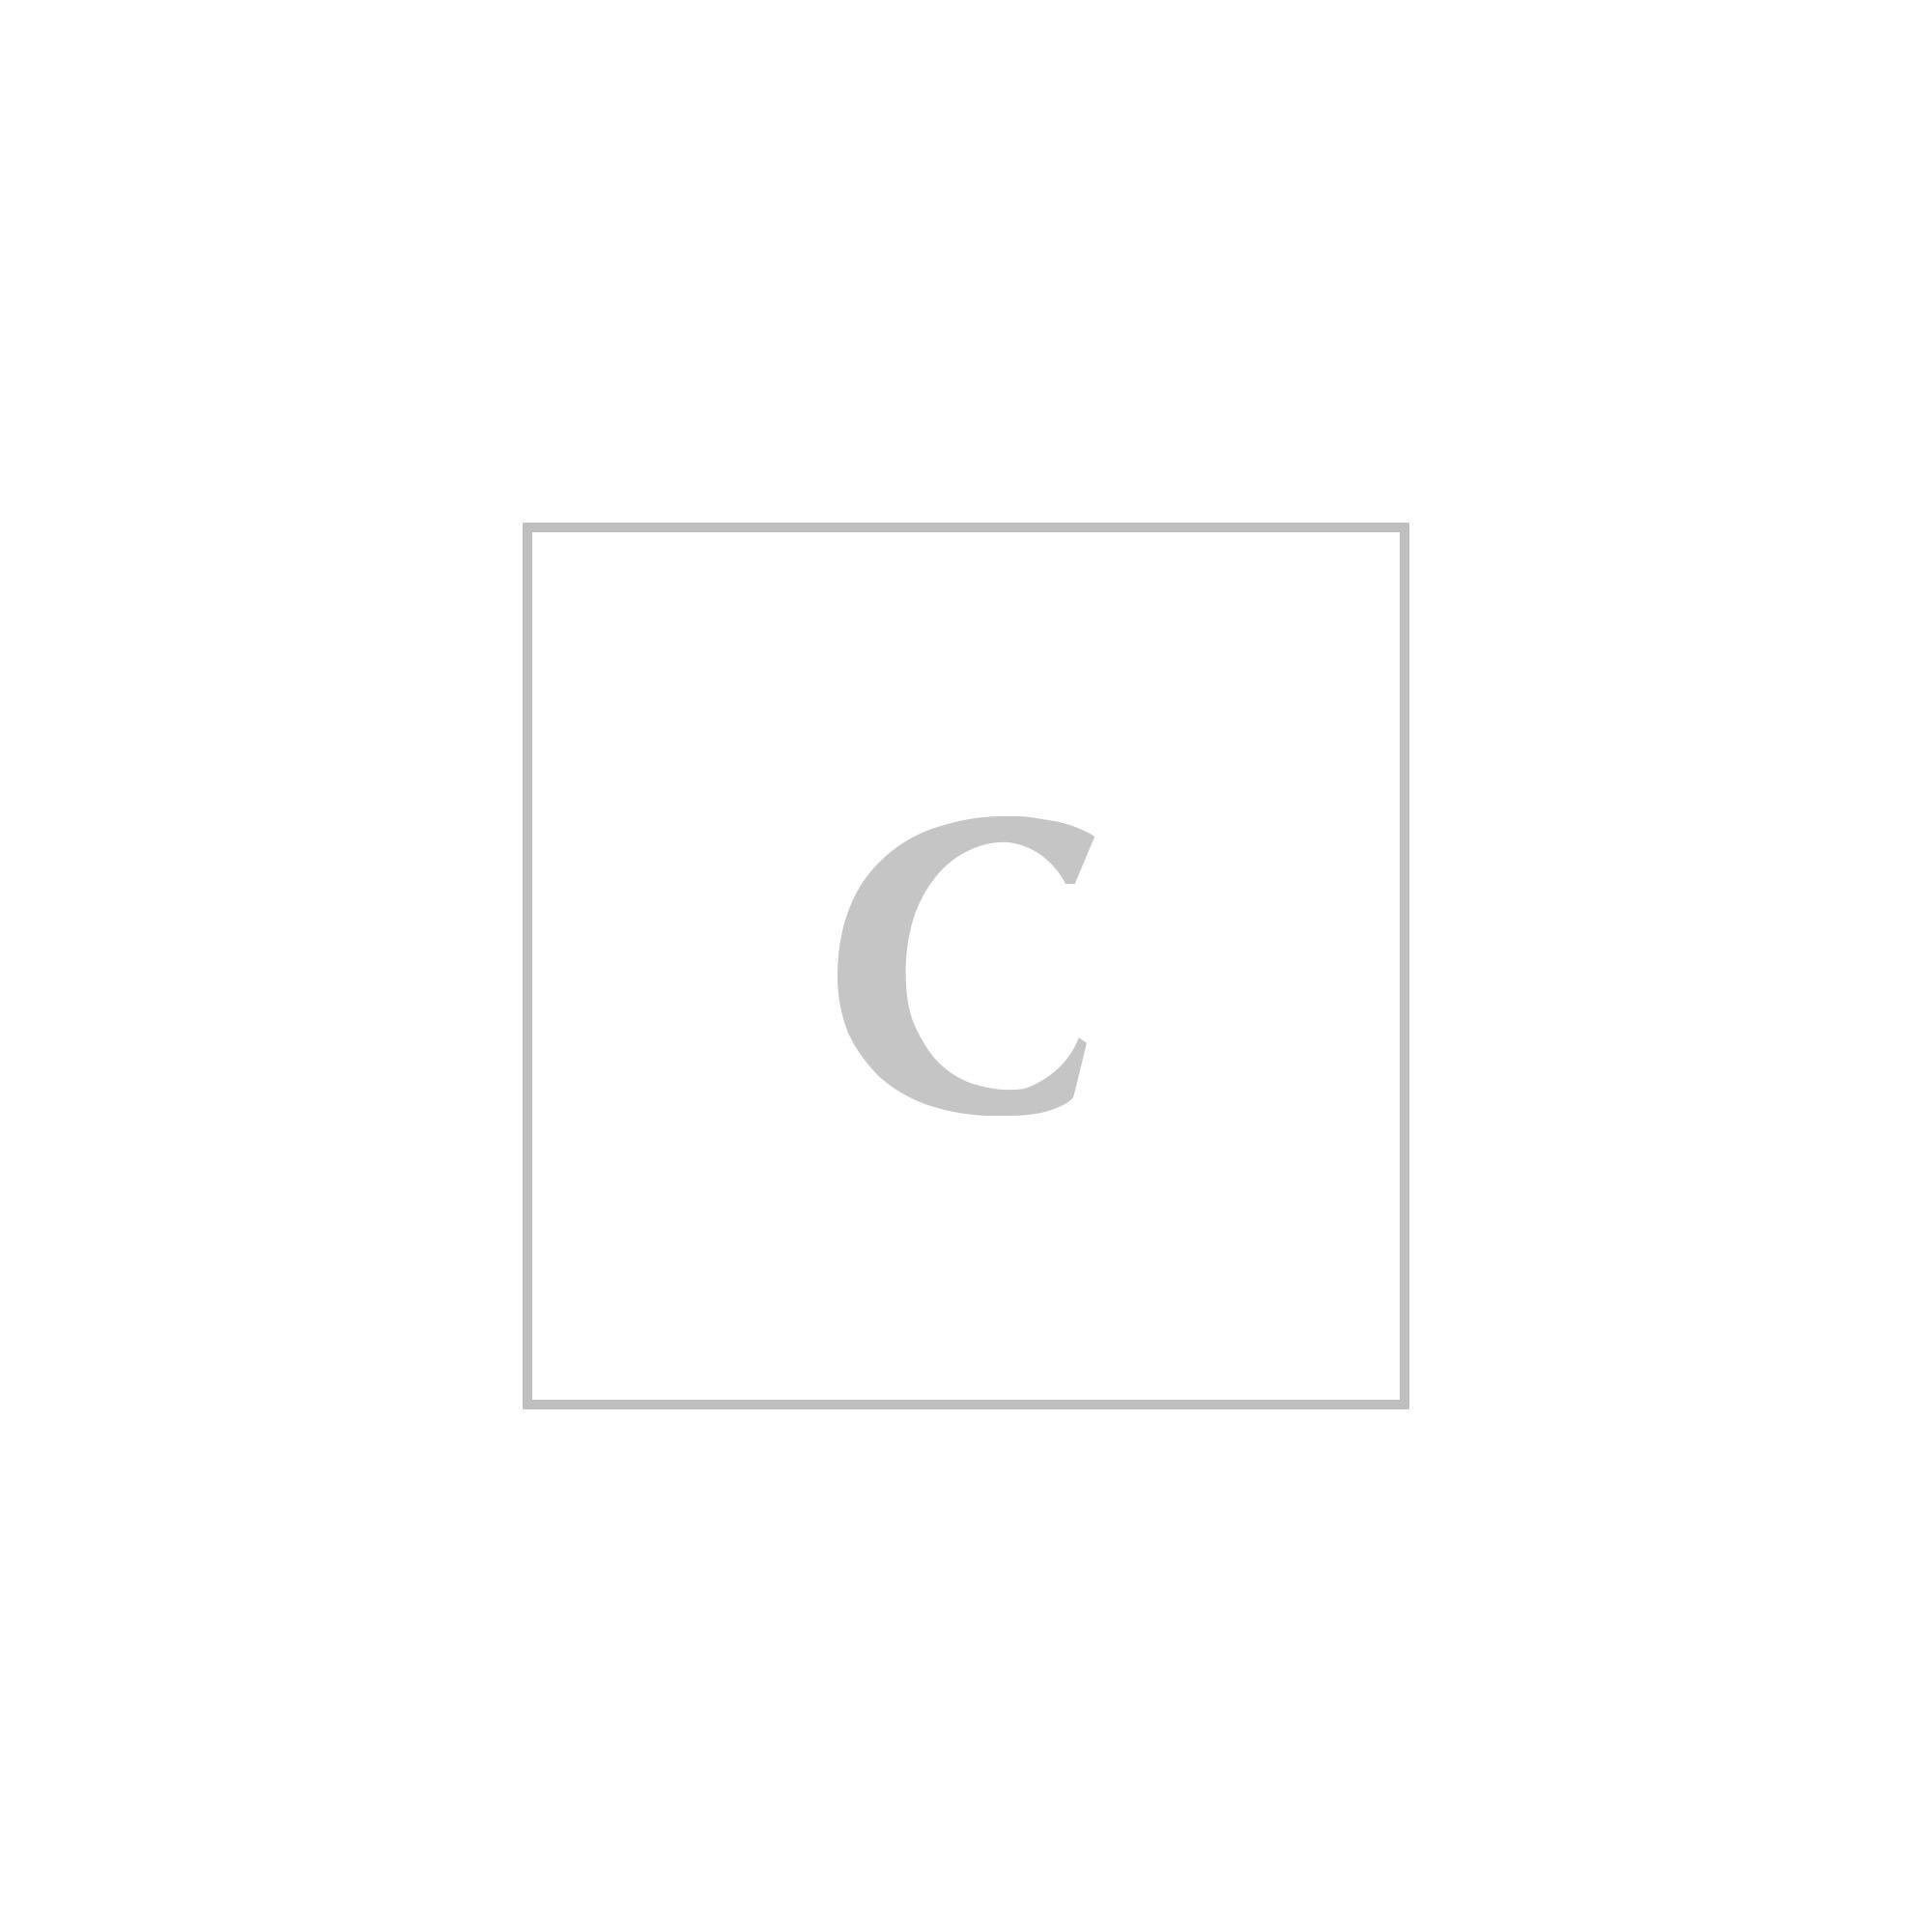 Saint laurent ysl borsa monogram